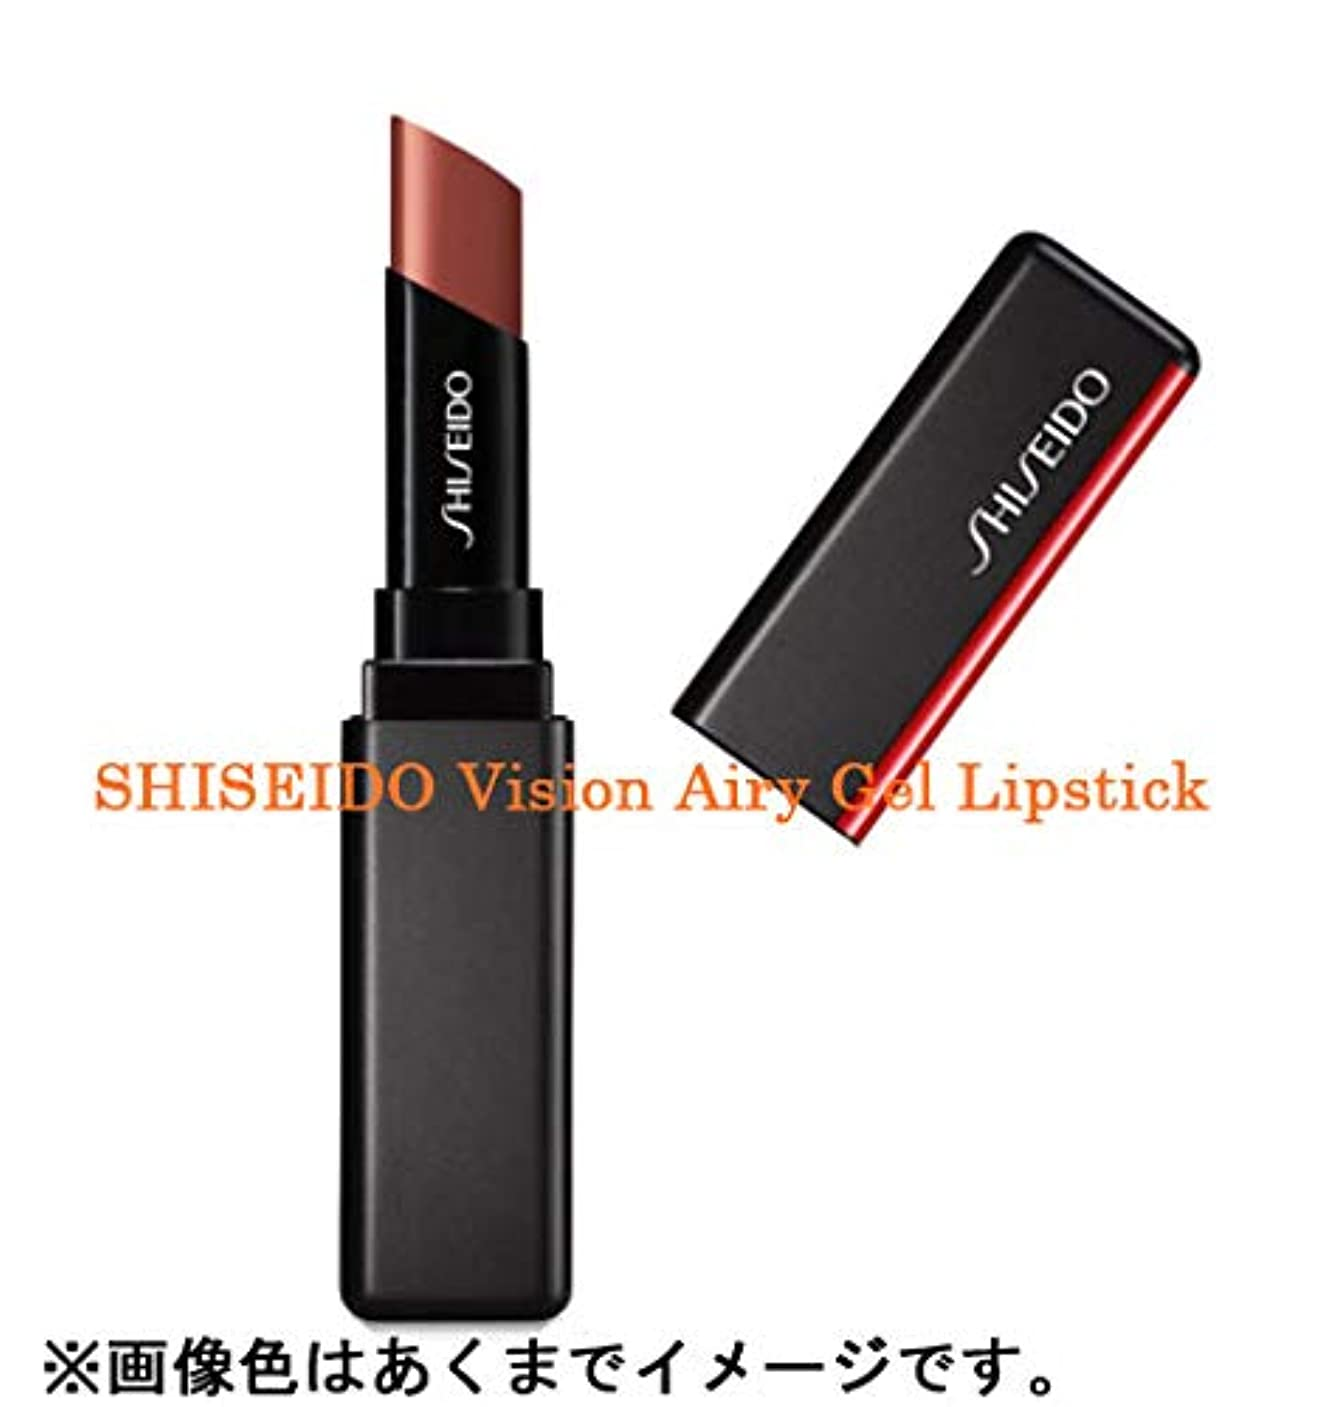 SHISEIDO Makeup(資生堂 メーキャップ) SHISEIDO(資生堂) SHISEIDO ヴィジョナリー ジェルリップスティック 1.6g (225)